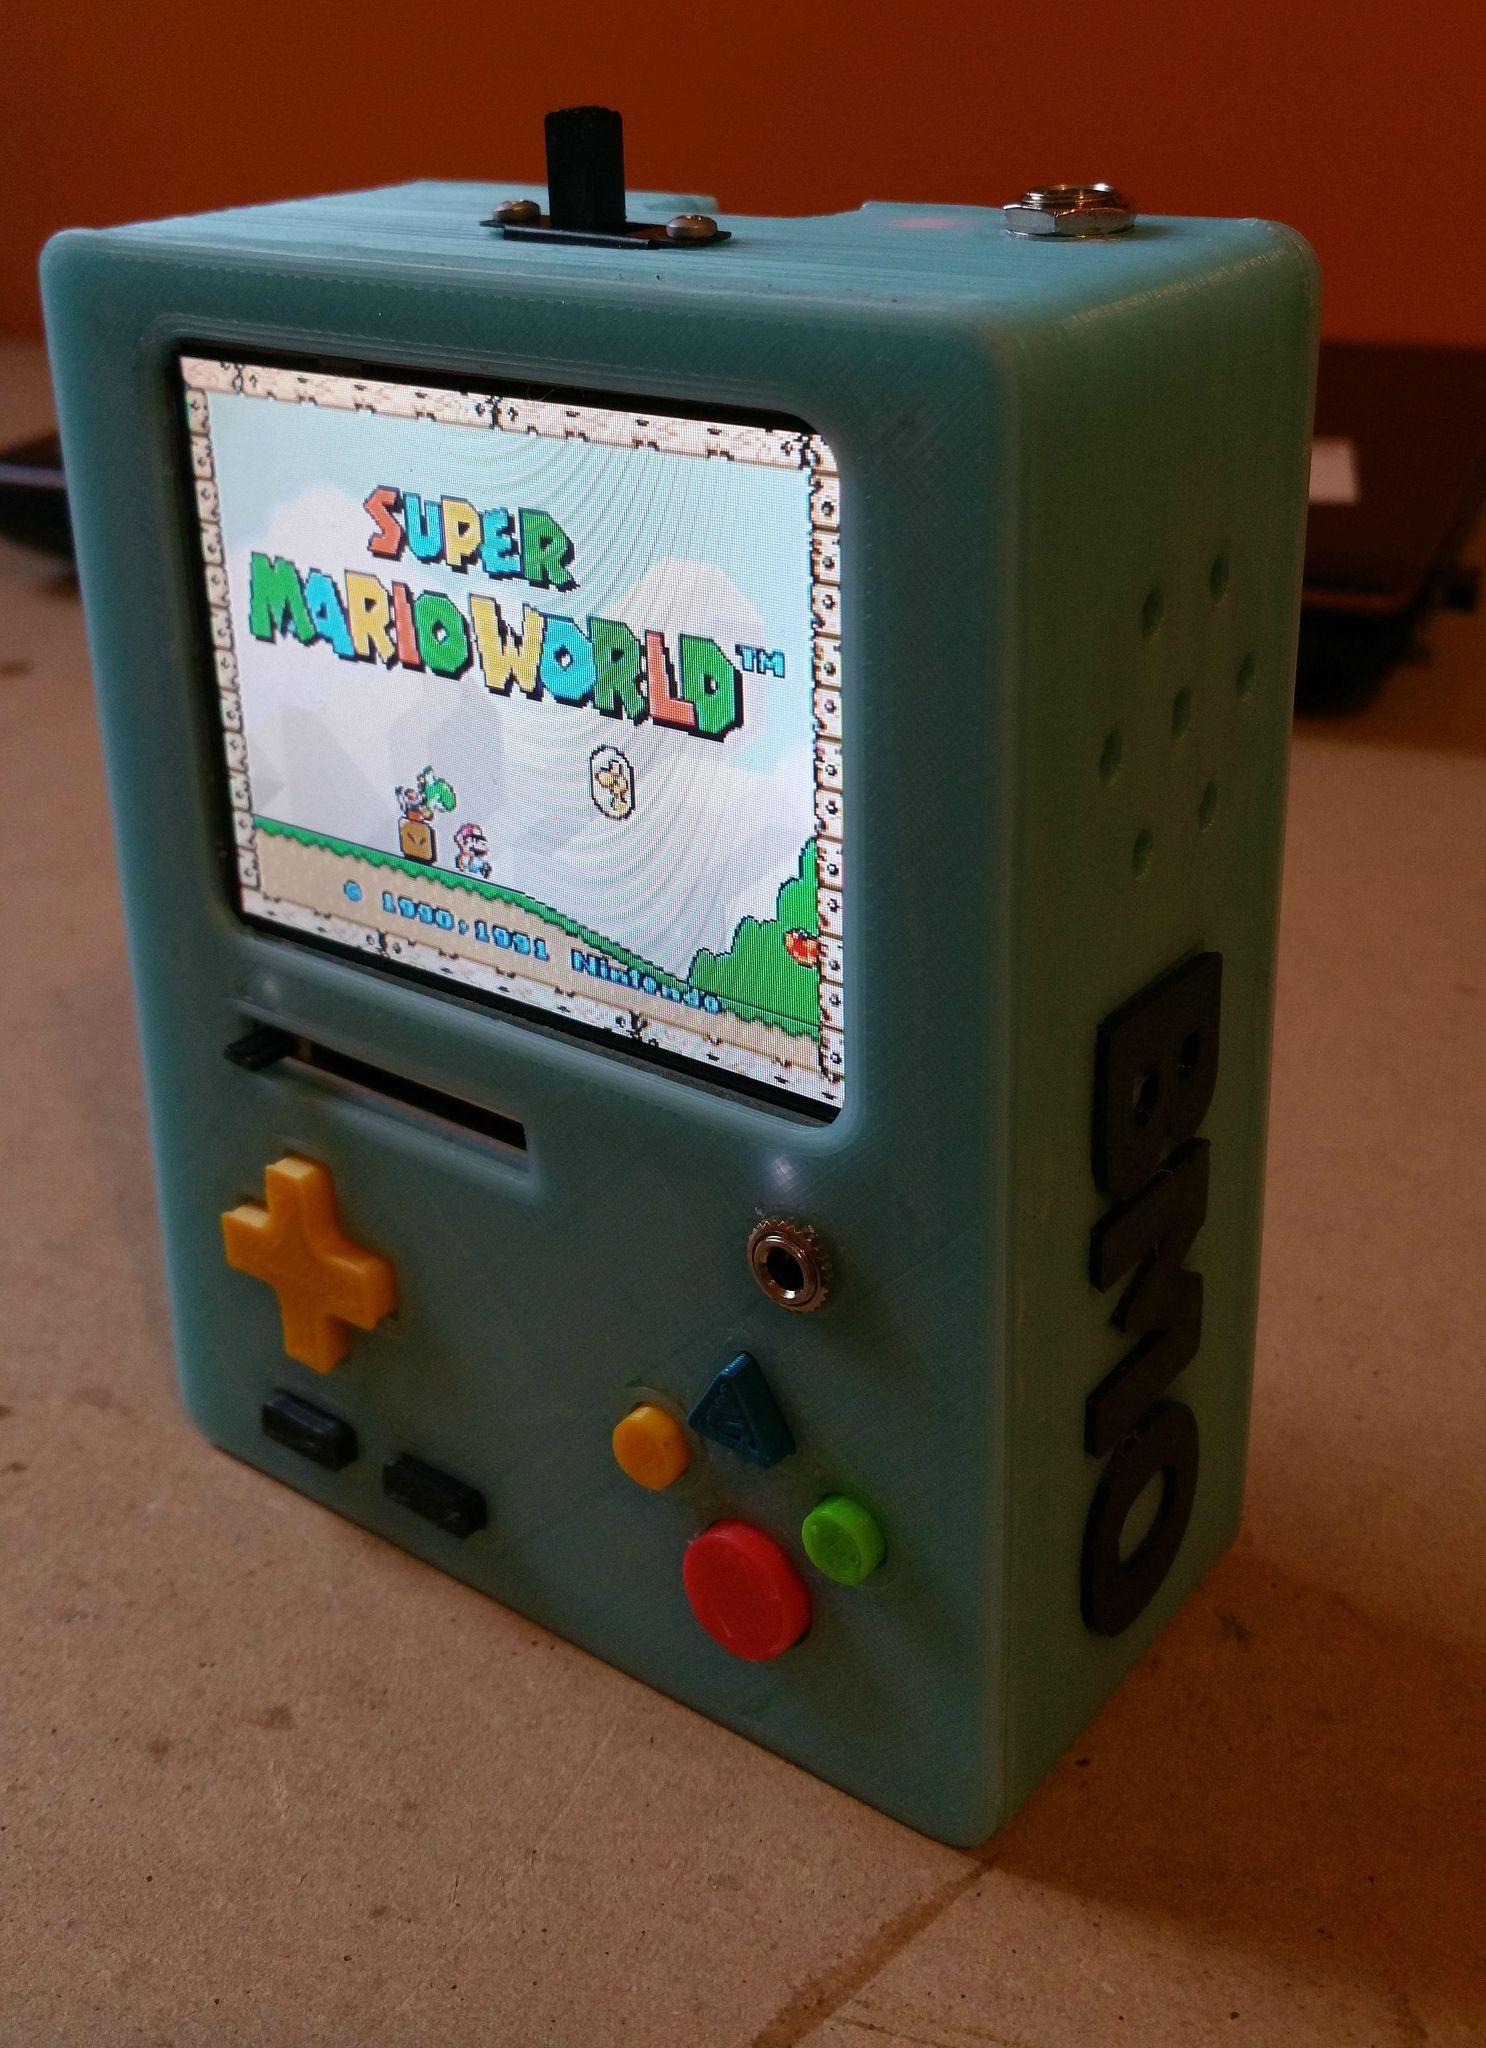 Adventure Time RaspBMO (Handheld Raspberry Pi Emulator